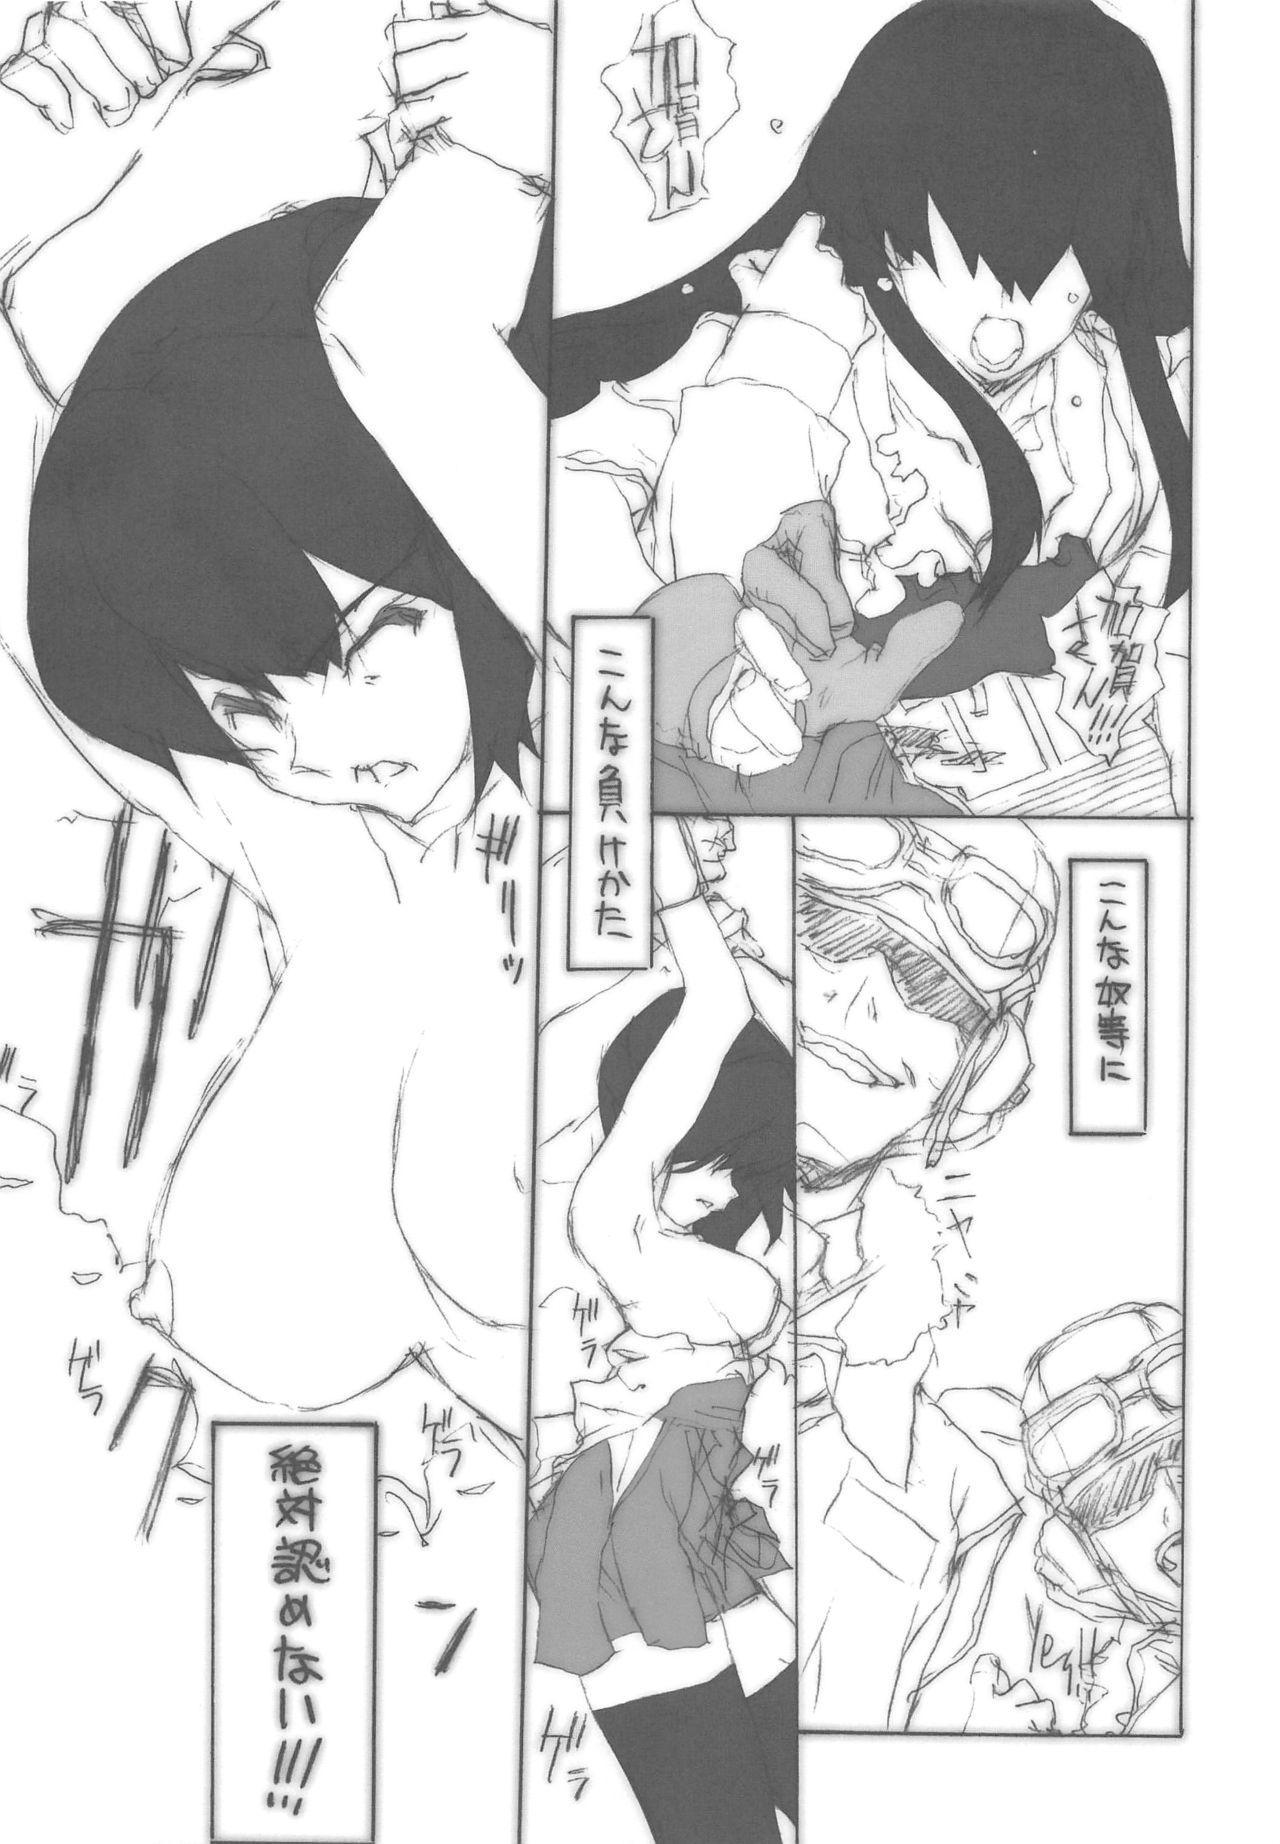 (C85) [Nise-Jyuusyofutei (Nakamura Takeshi)] Hokui 30-do 13-pun 59-byou Seikei 179-do 7-fun 12-byou (Kantai Collection -KanColle-) 7